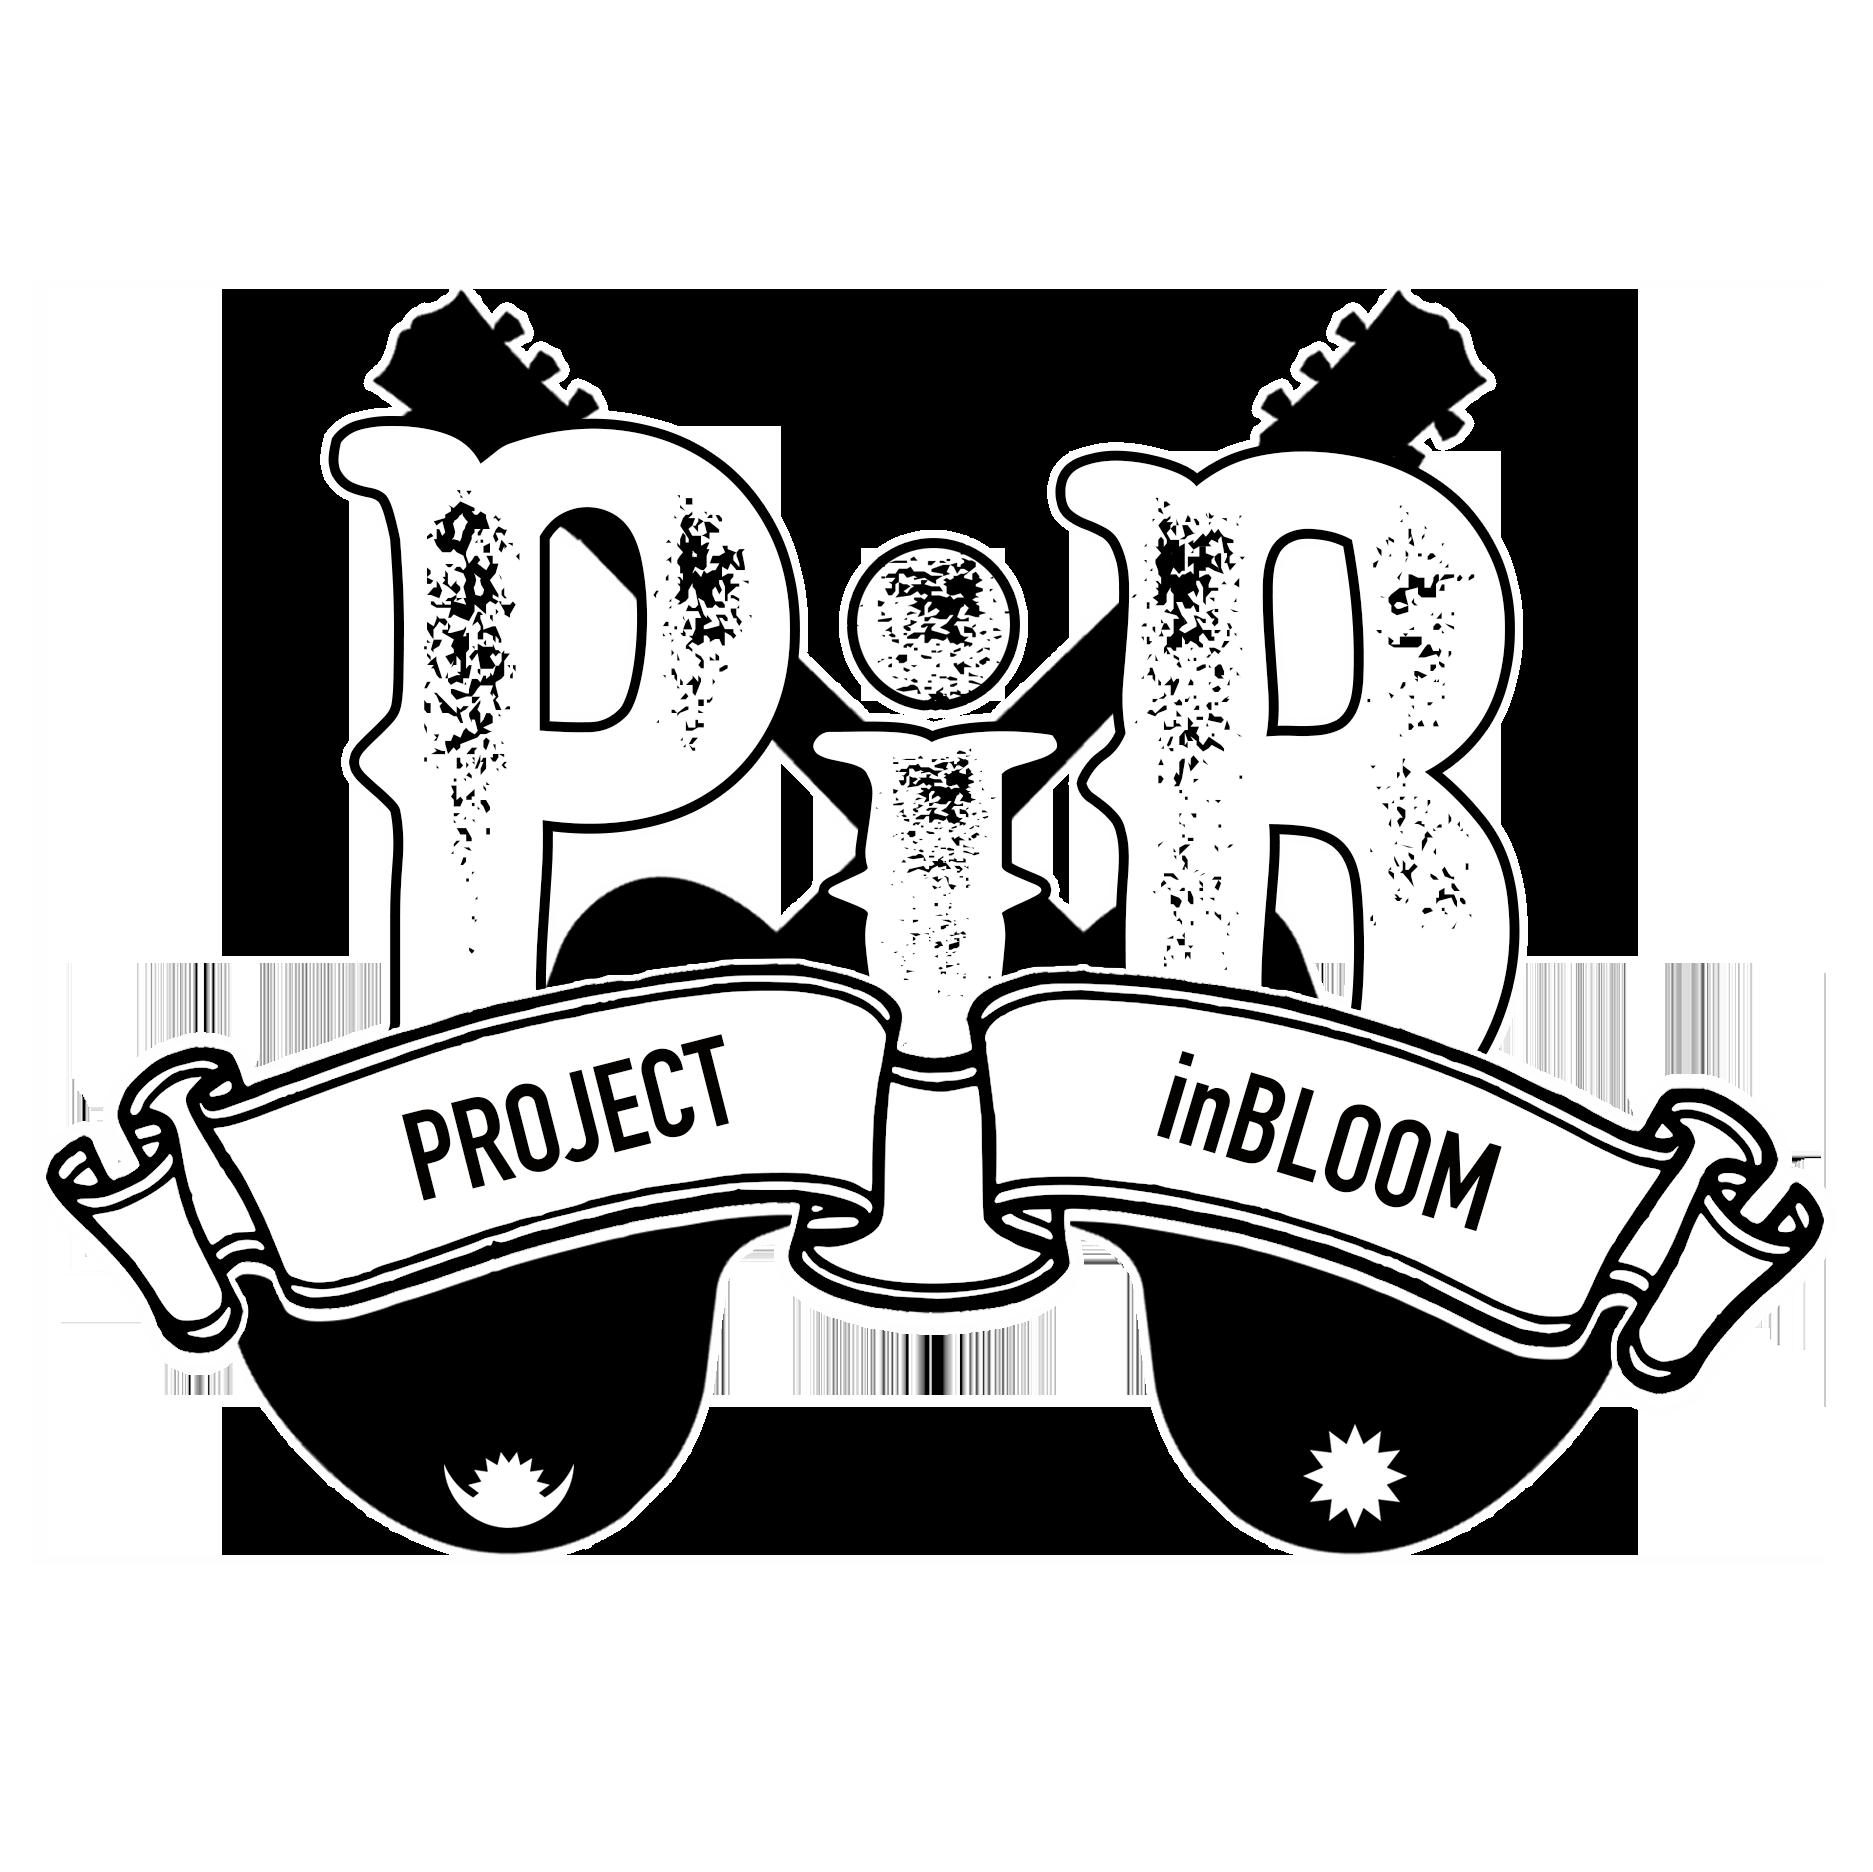 project inbloom members